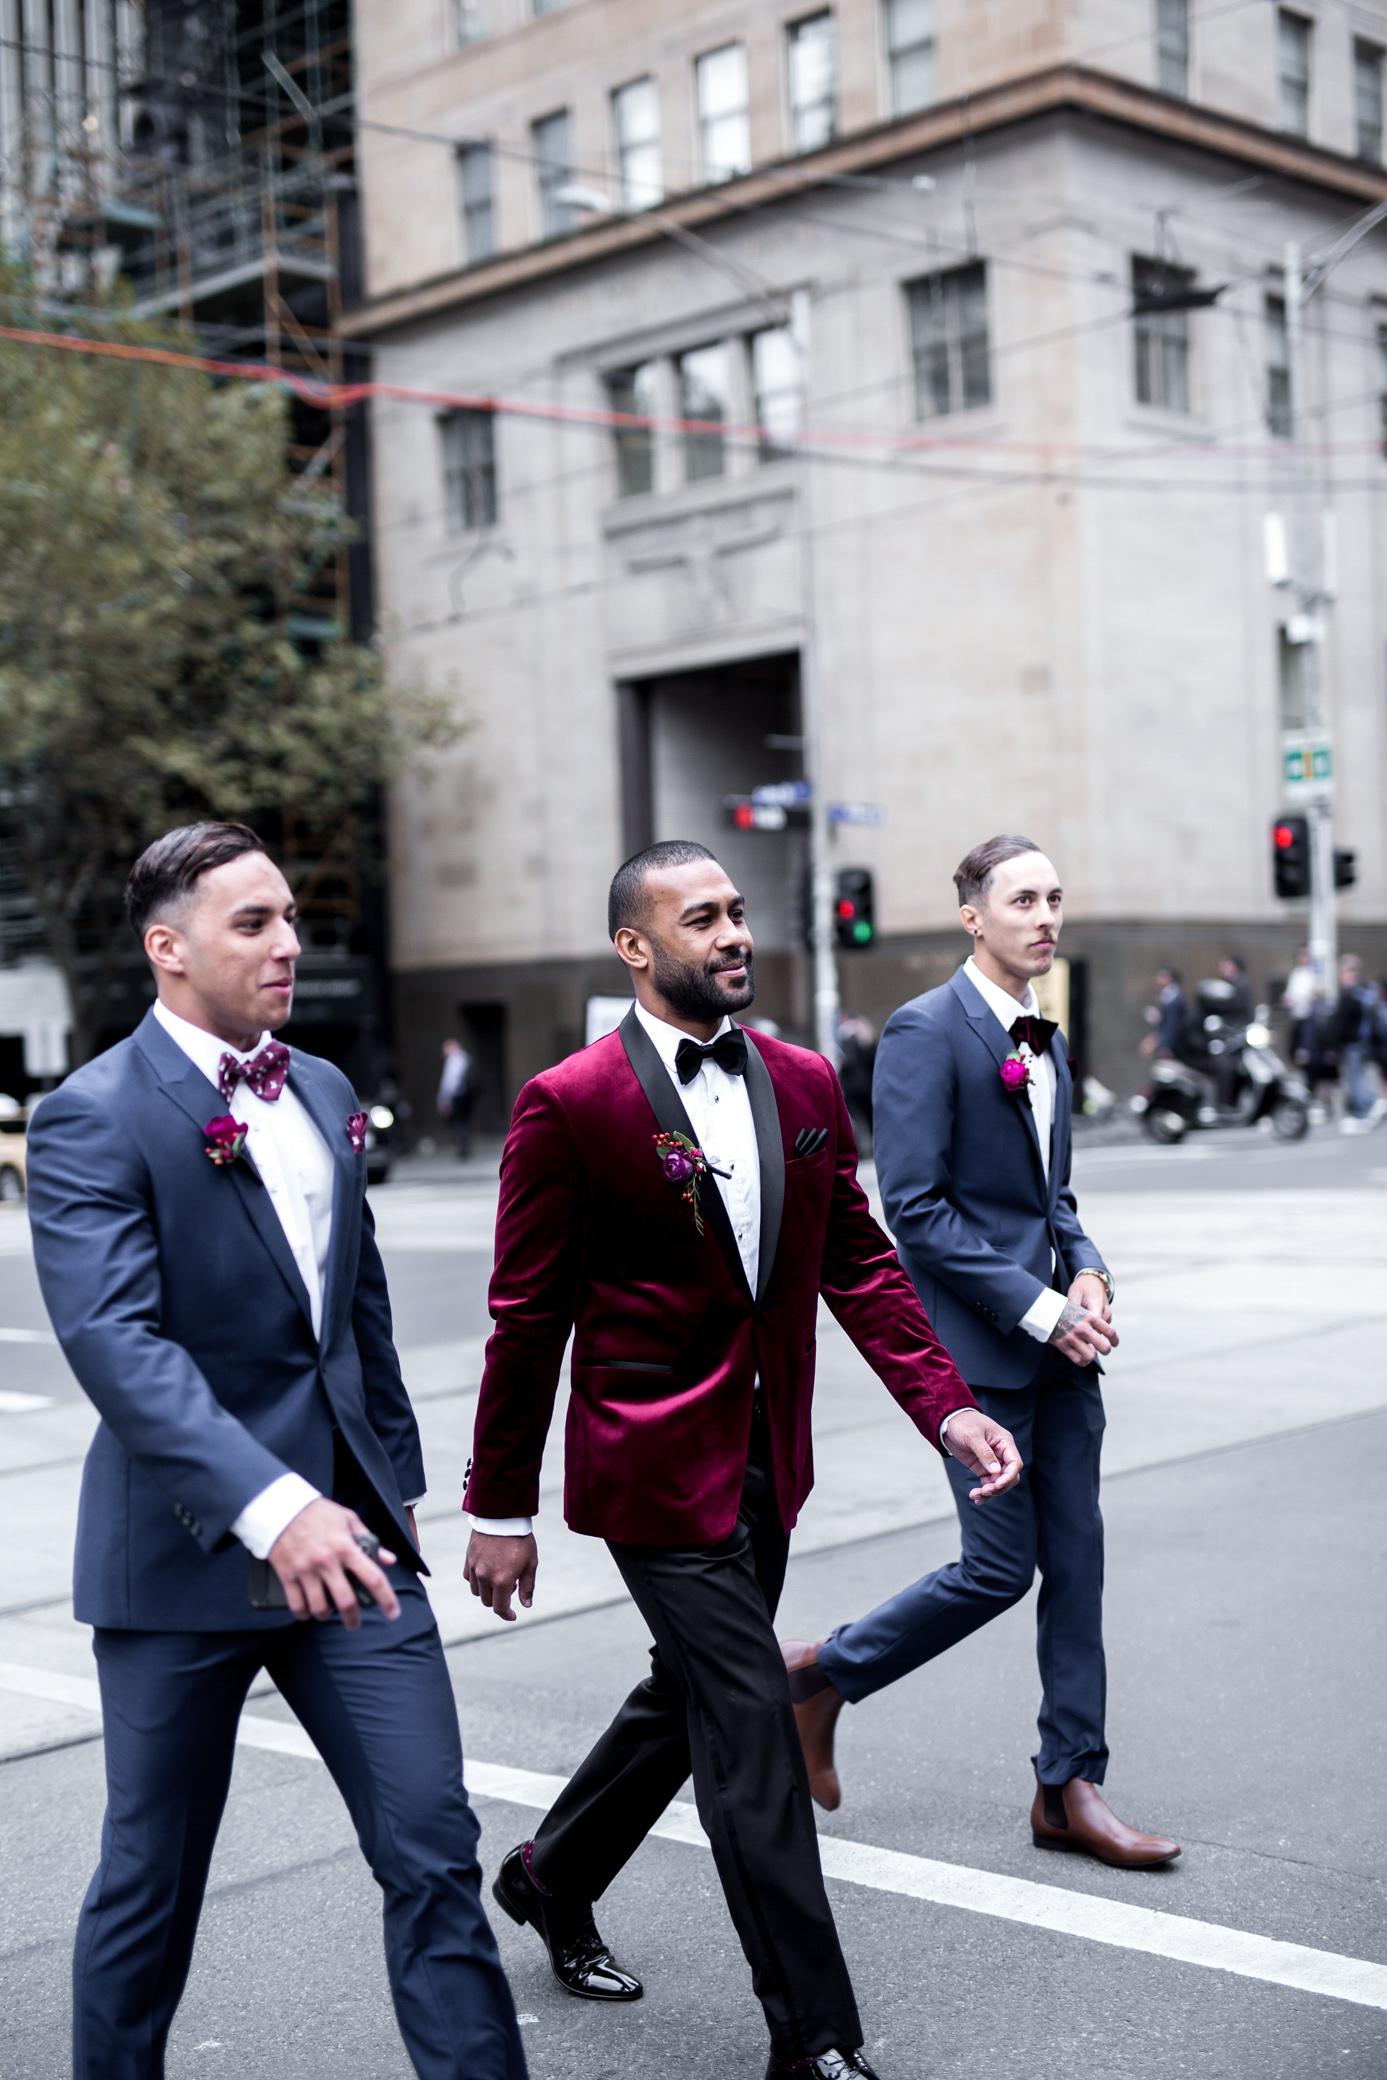 mr-theodore_white-vine-photography_same-sex-wedding-directory19.jpg